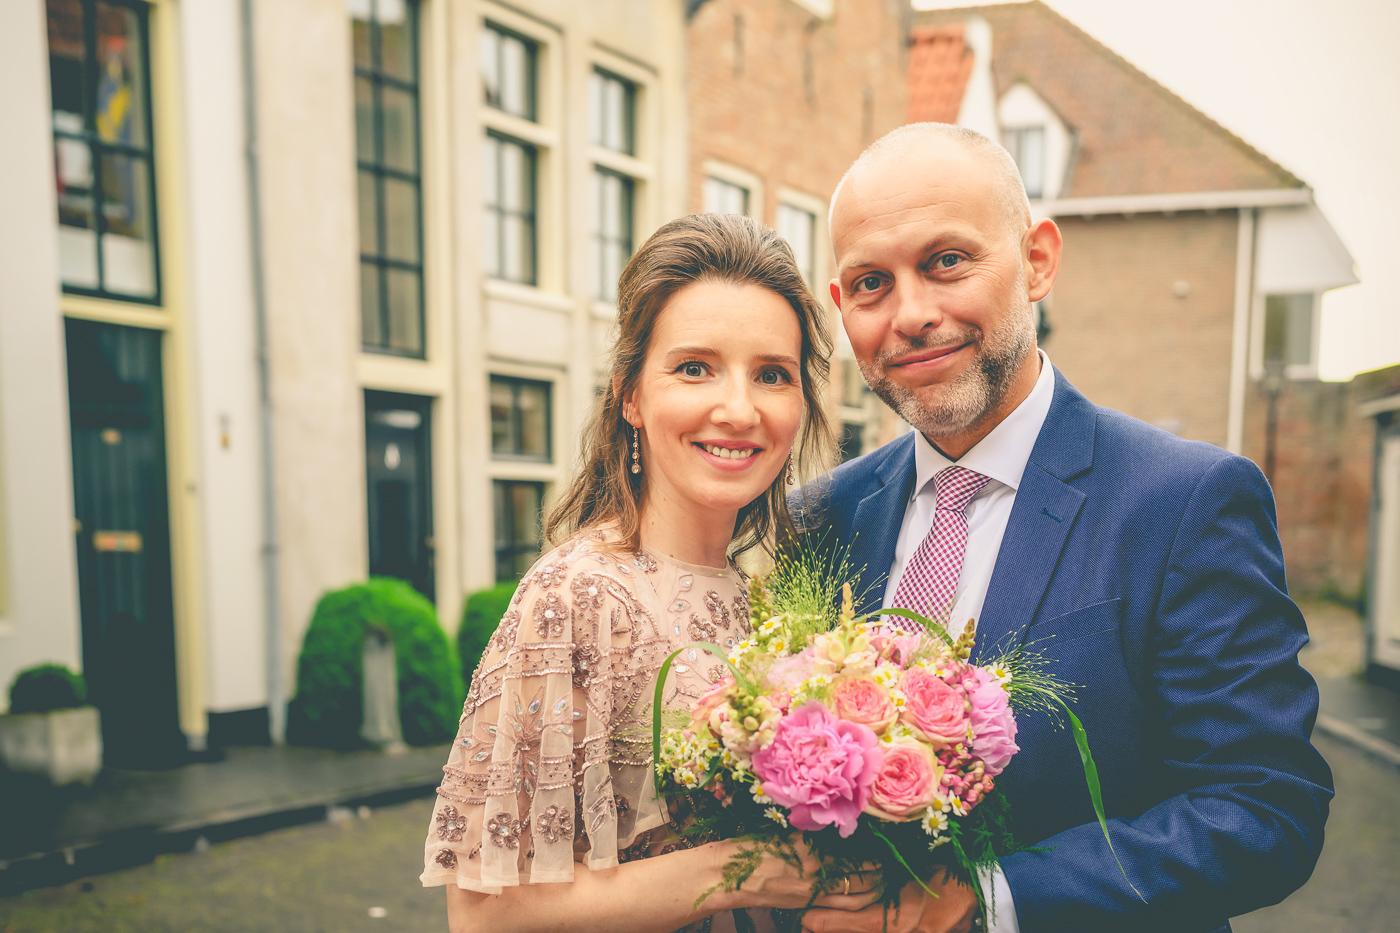 Bruidsfotografie, trouwfotograaf, trouwfoto's Veluwe, Harderwijk